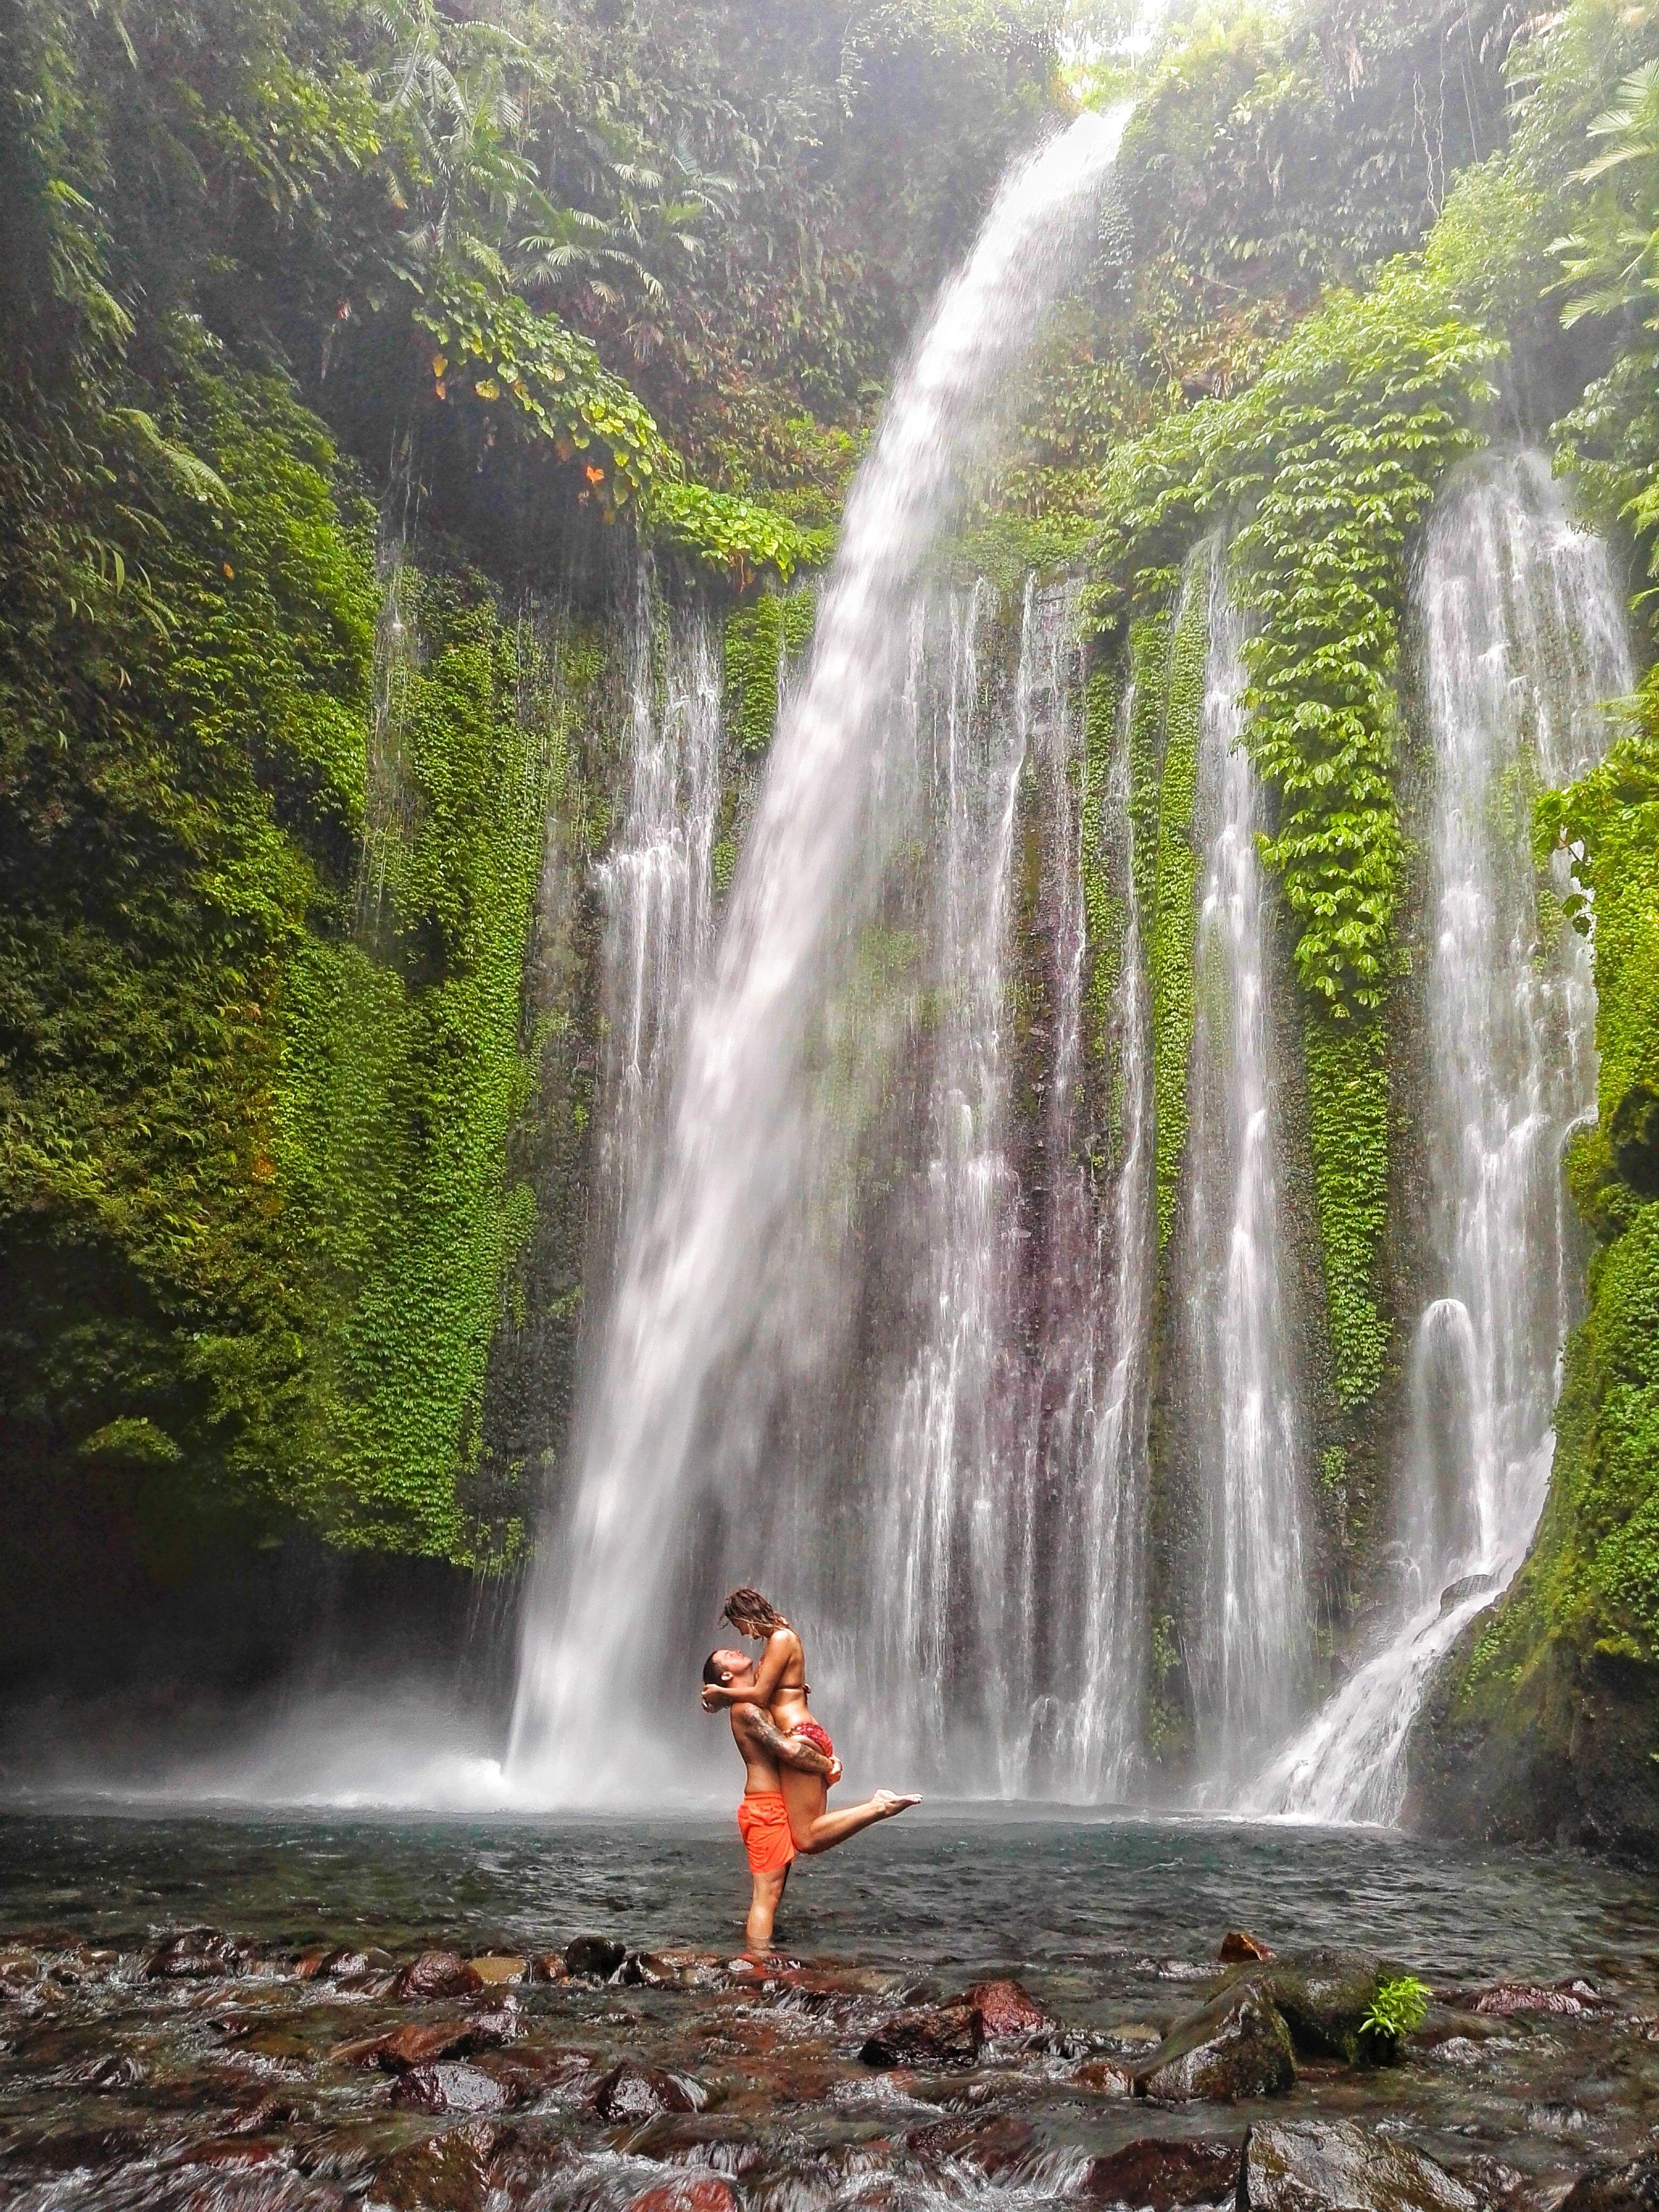 How To Find The Tiu Kelep Waterfall In Lombok Waterfall Indonesia Travel Lombok